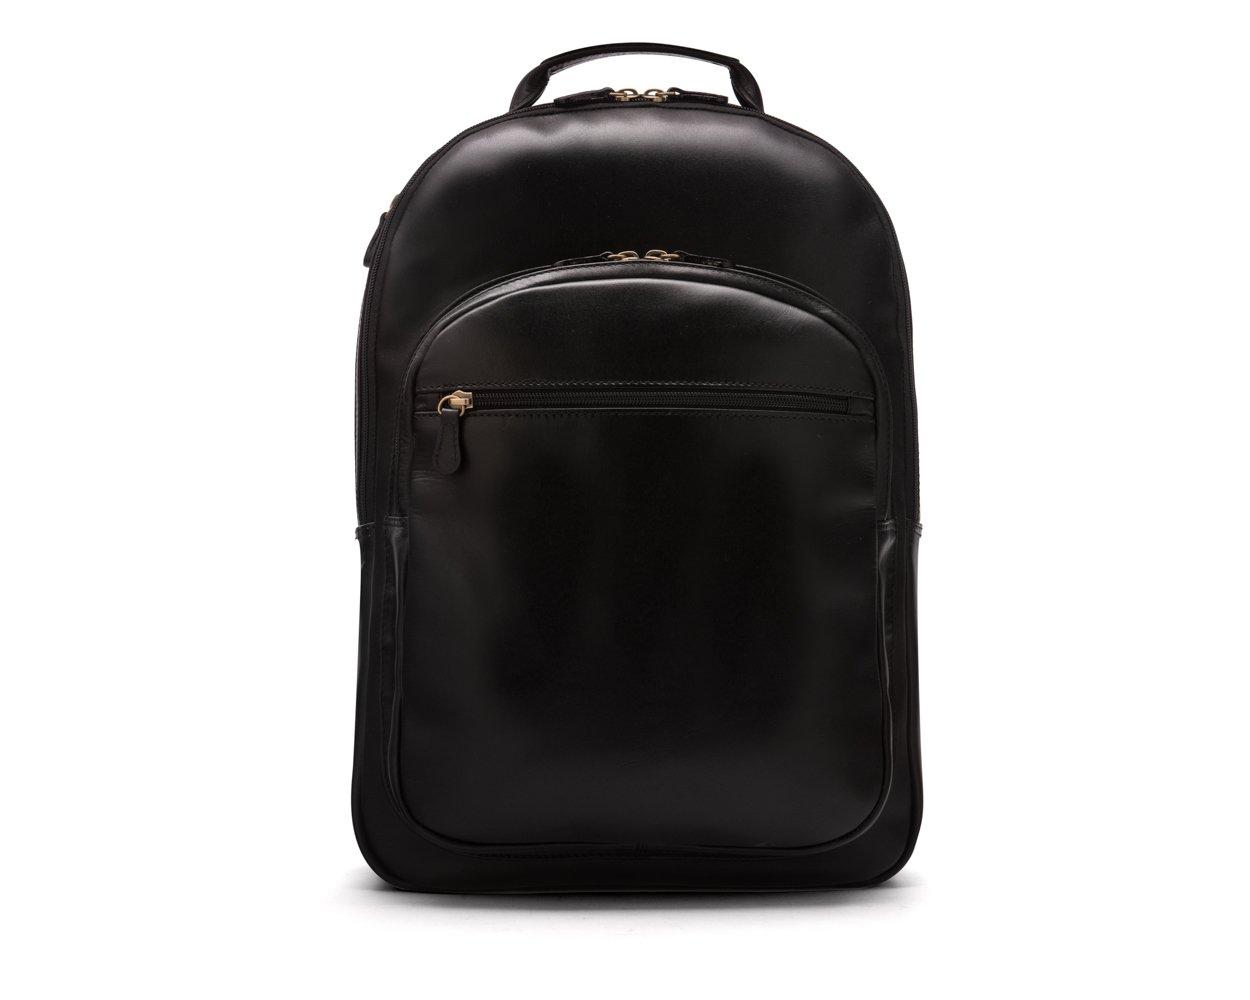 SAGEBROWN Black Cambridge Backpack